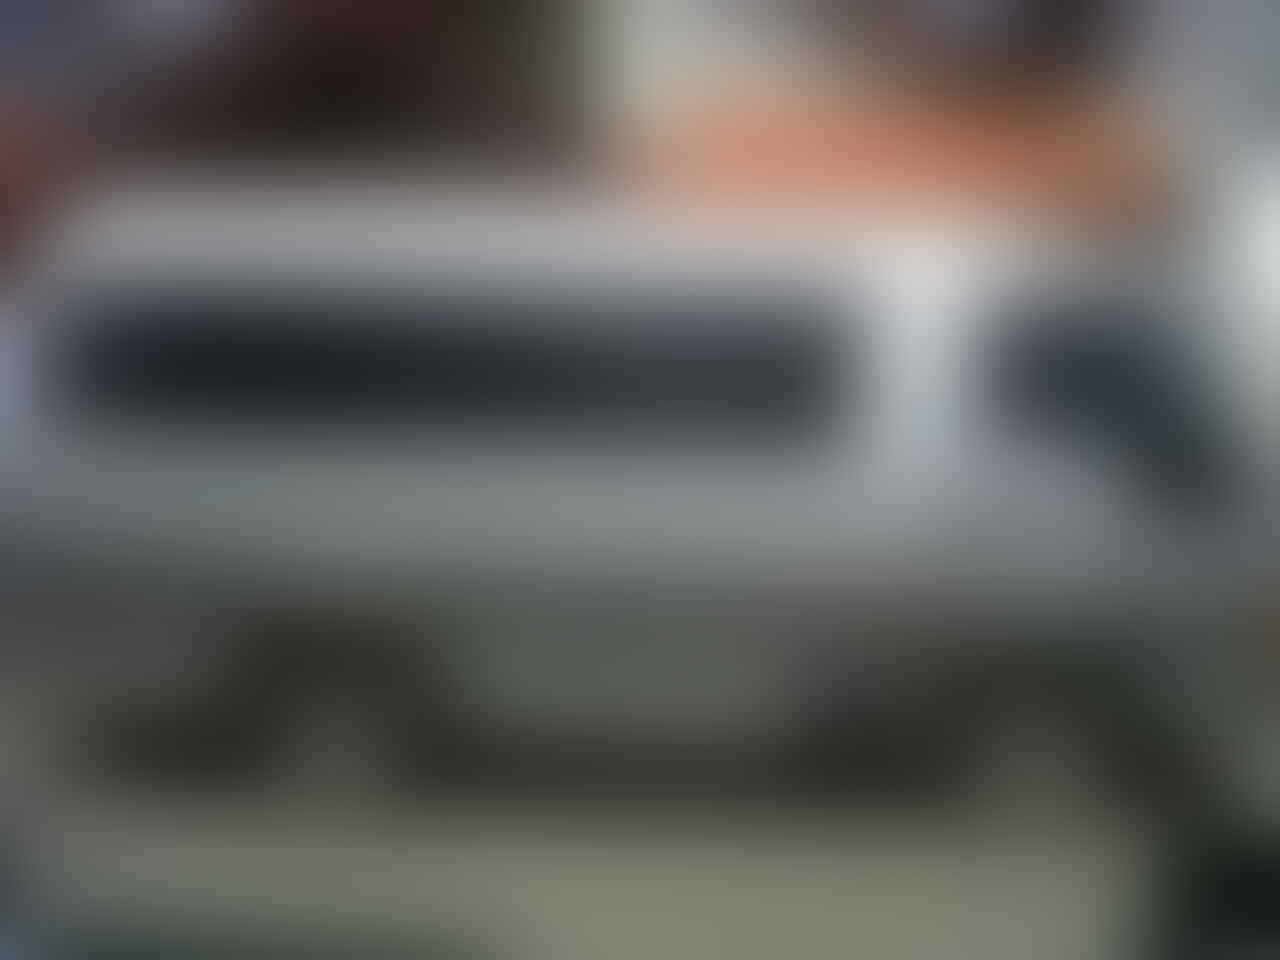 Sewa Mobil Surabaya Cv.Permata Indah Trans Surabaya